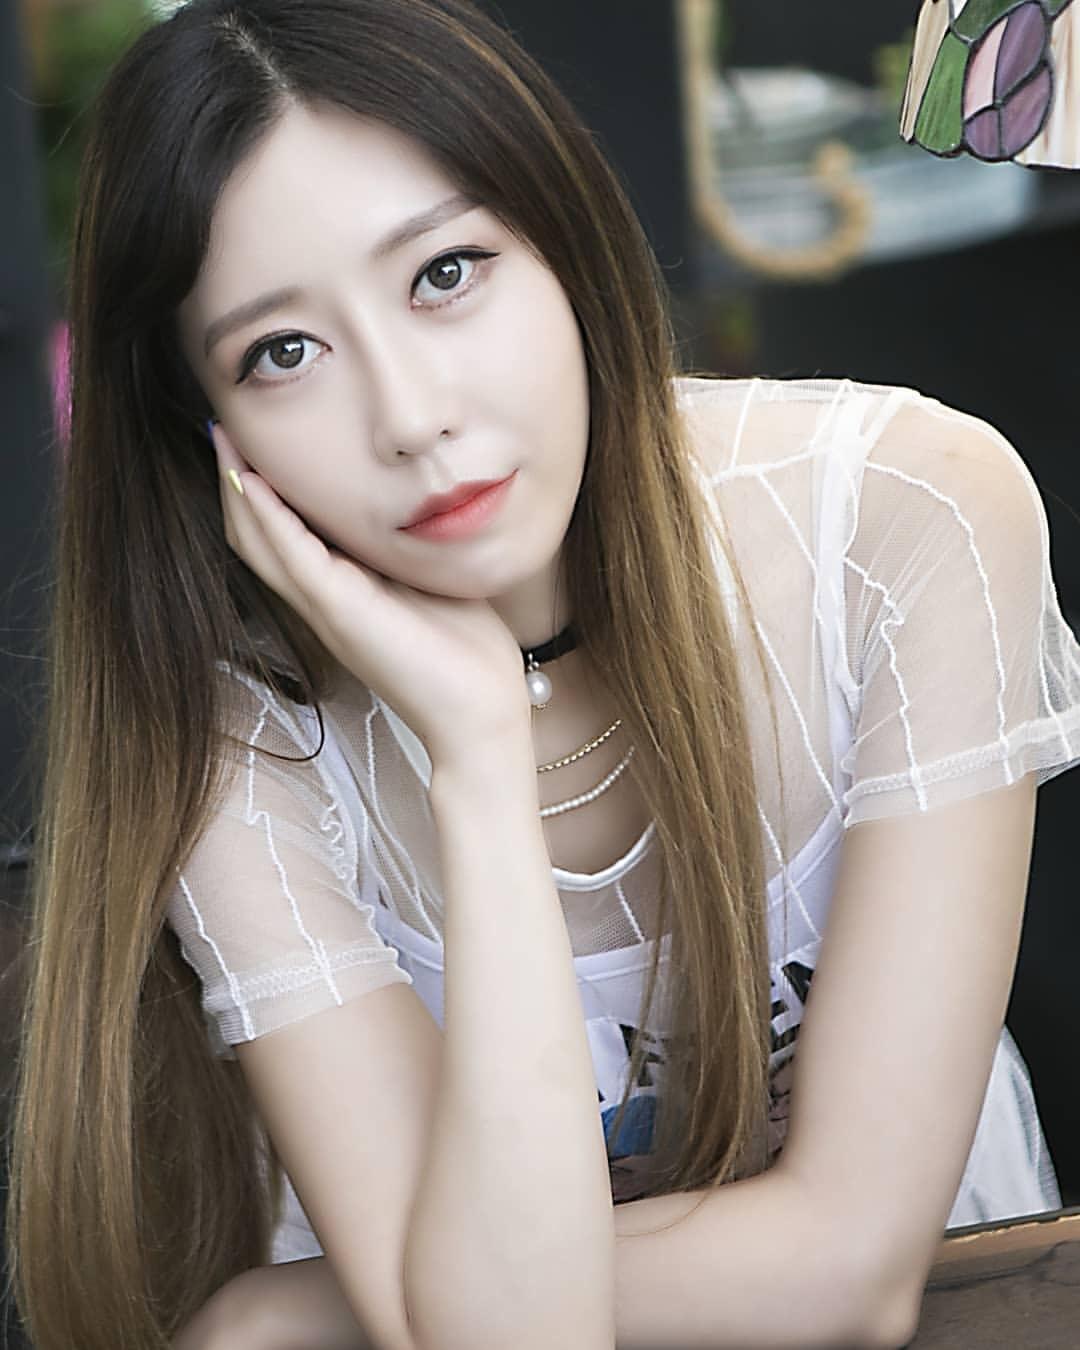 Seongeon